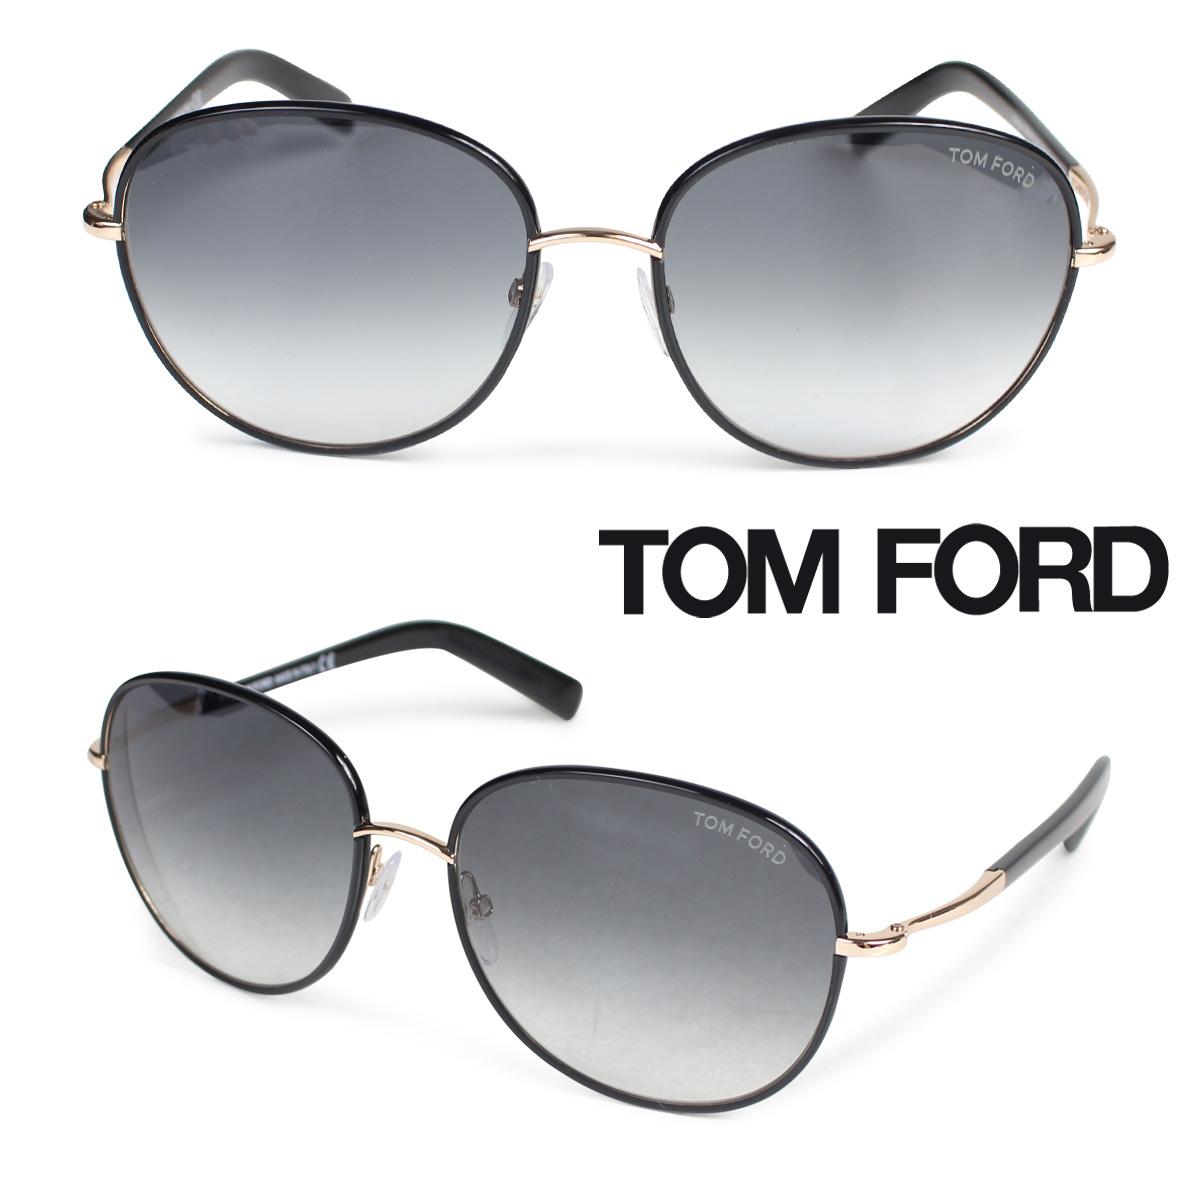 TOM FORD トムフォード サングラス メガネ メンズ レディース アイウェア FT0498 GEORGIA SUNGLASSES ブラック [177]